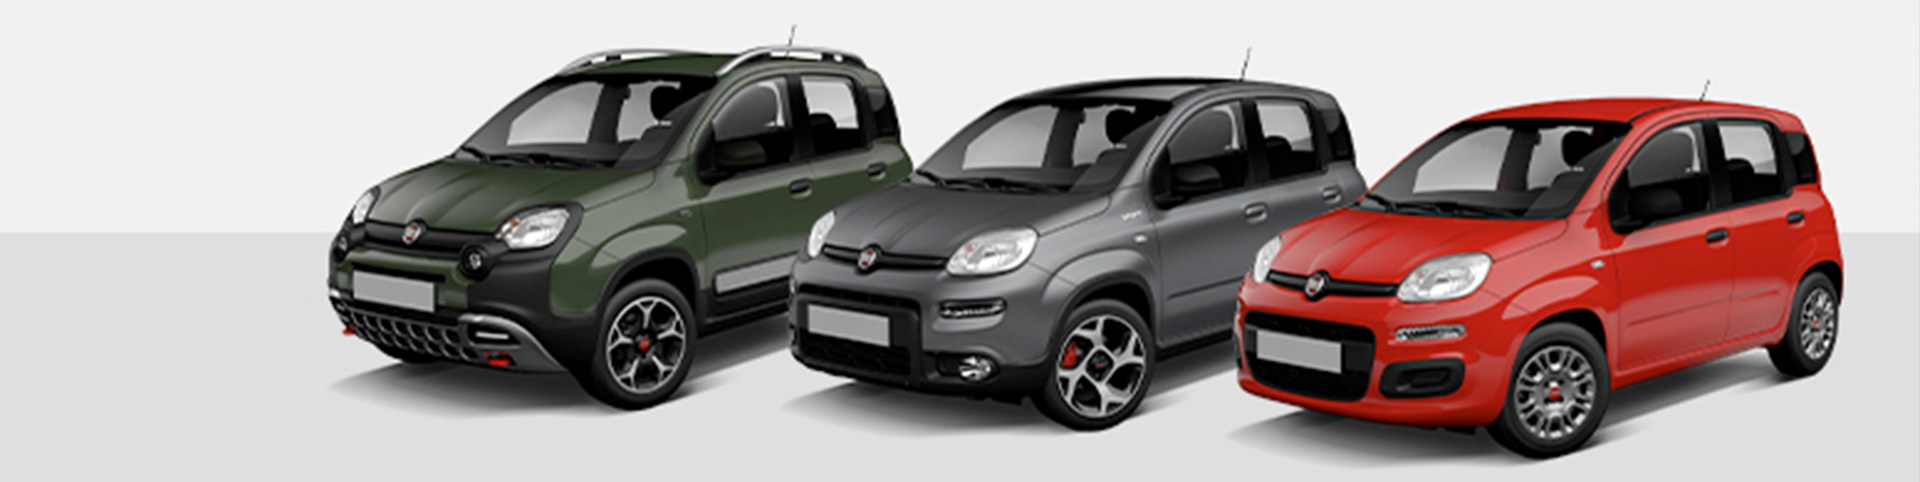 Fiat Panda Autozentren P&A-Preckel